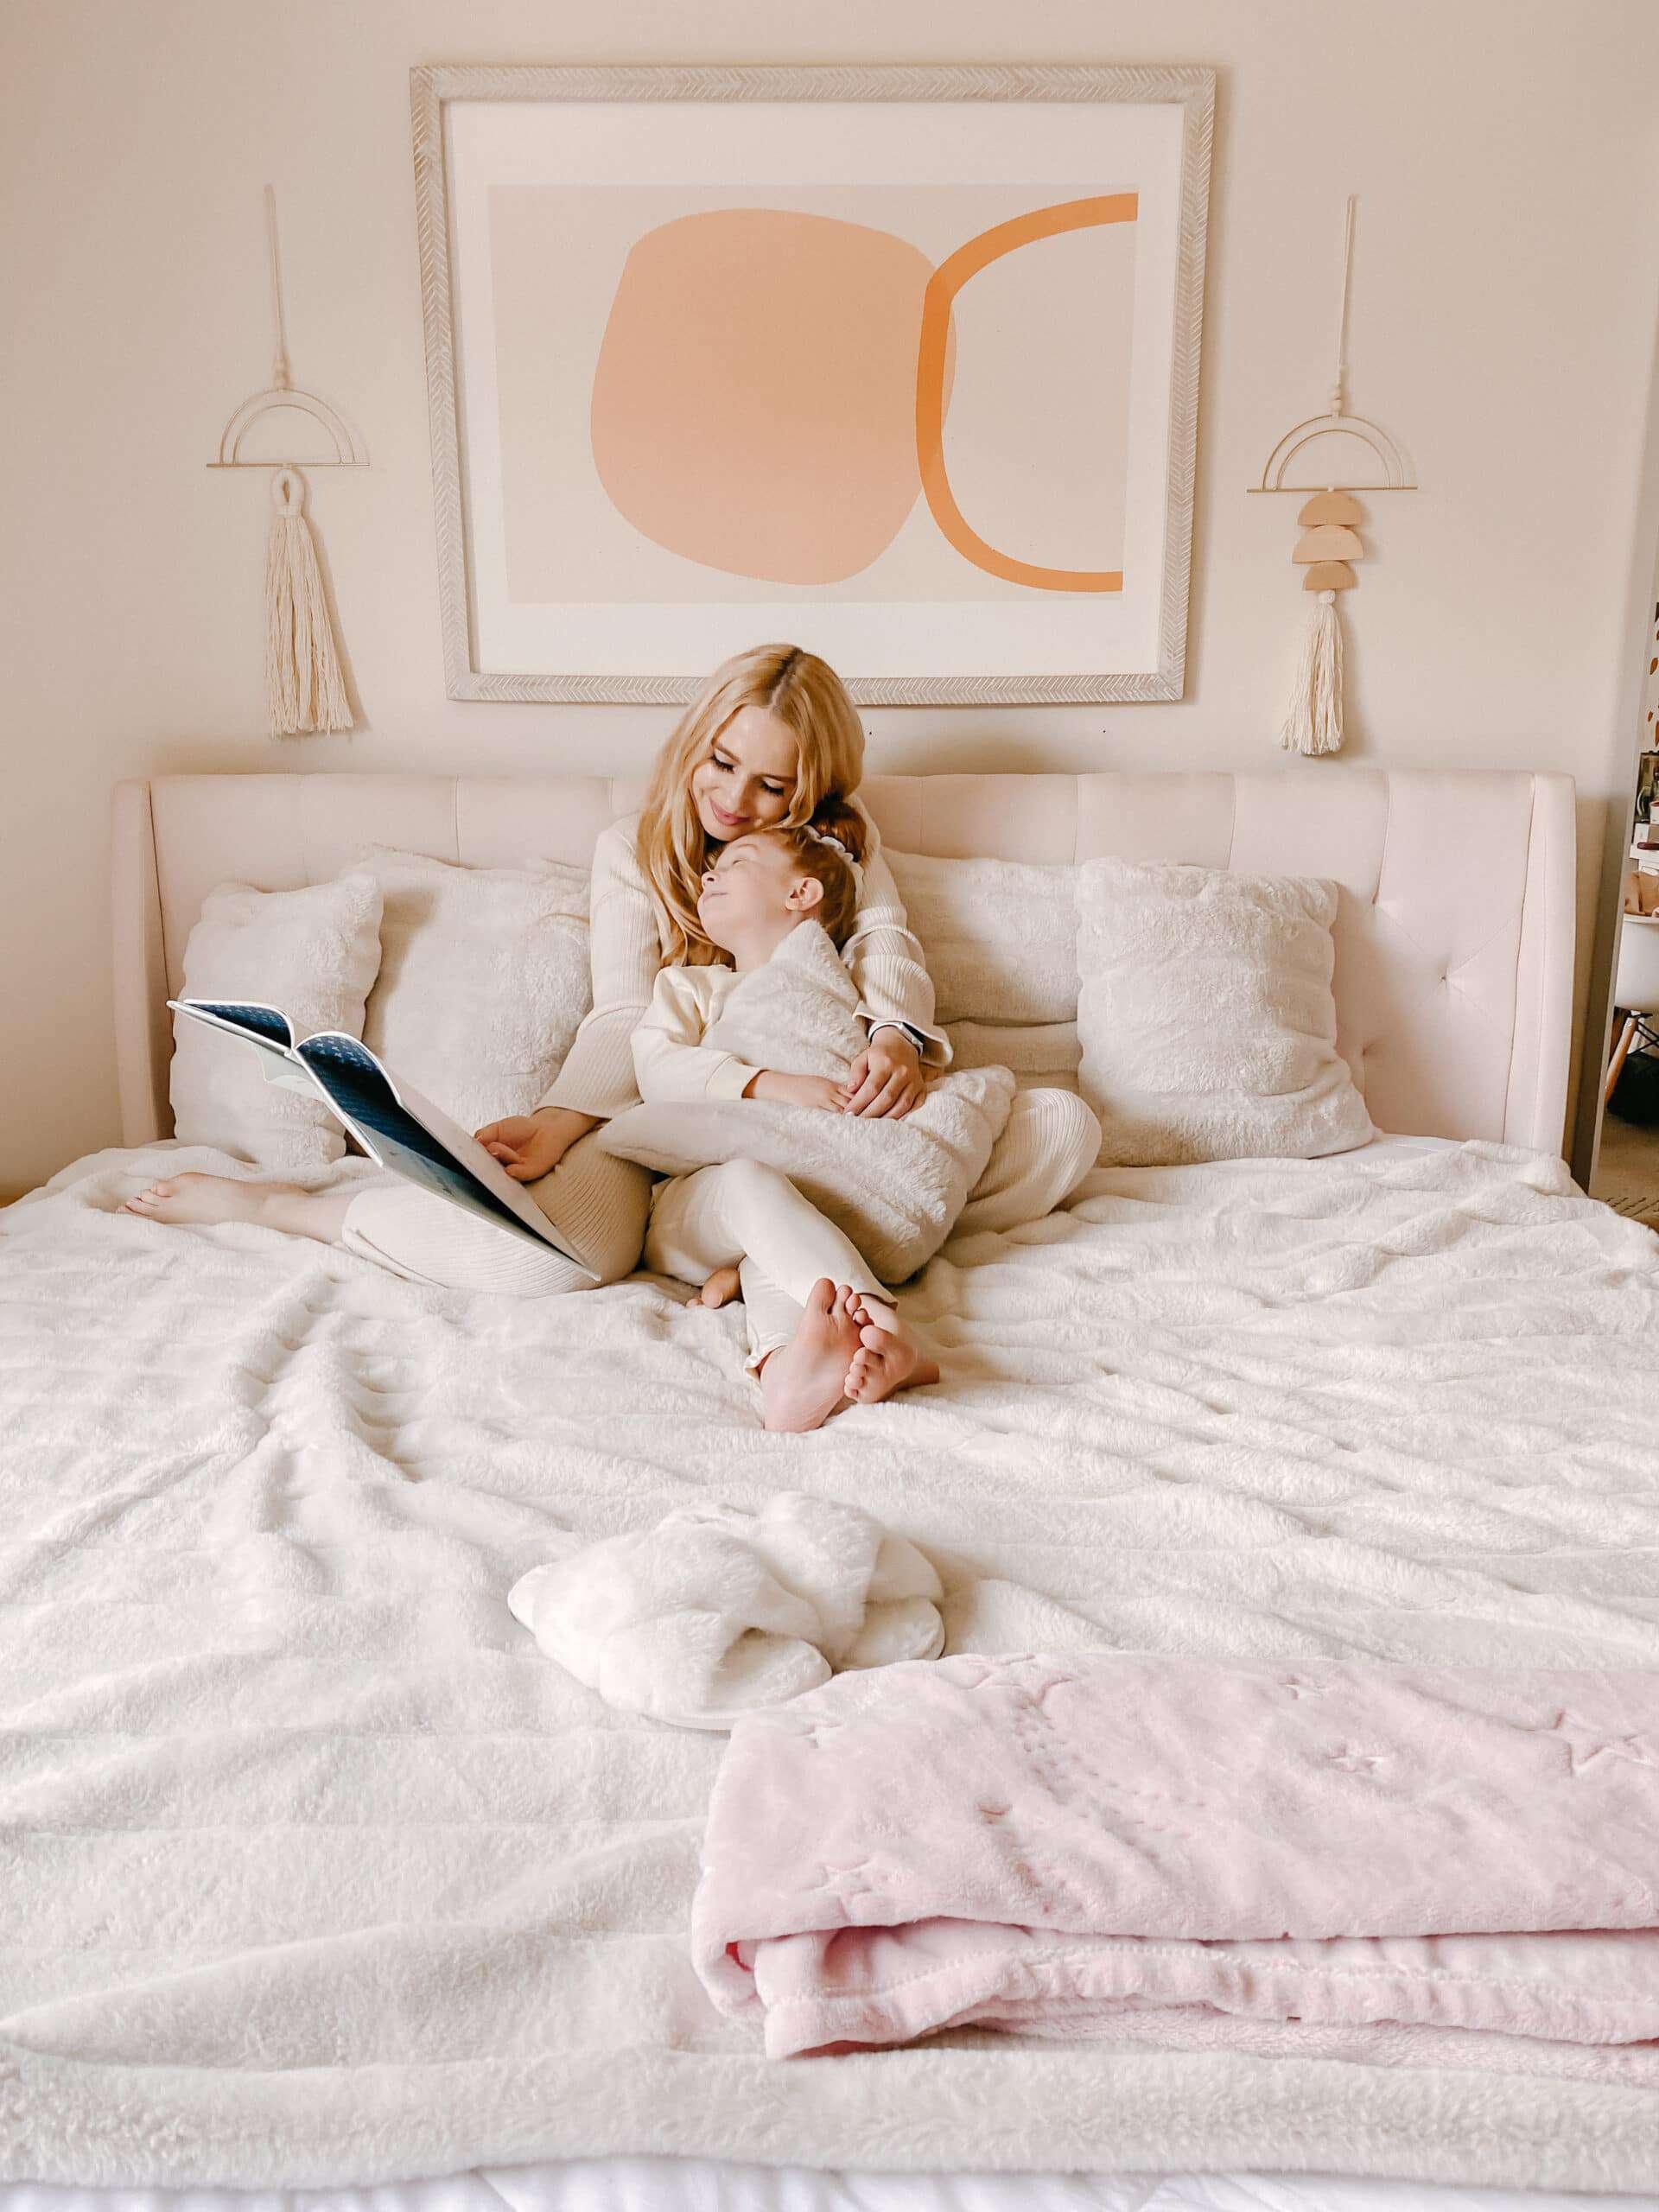 Celeste Wright bedroom Cozy Bliss